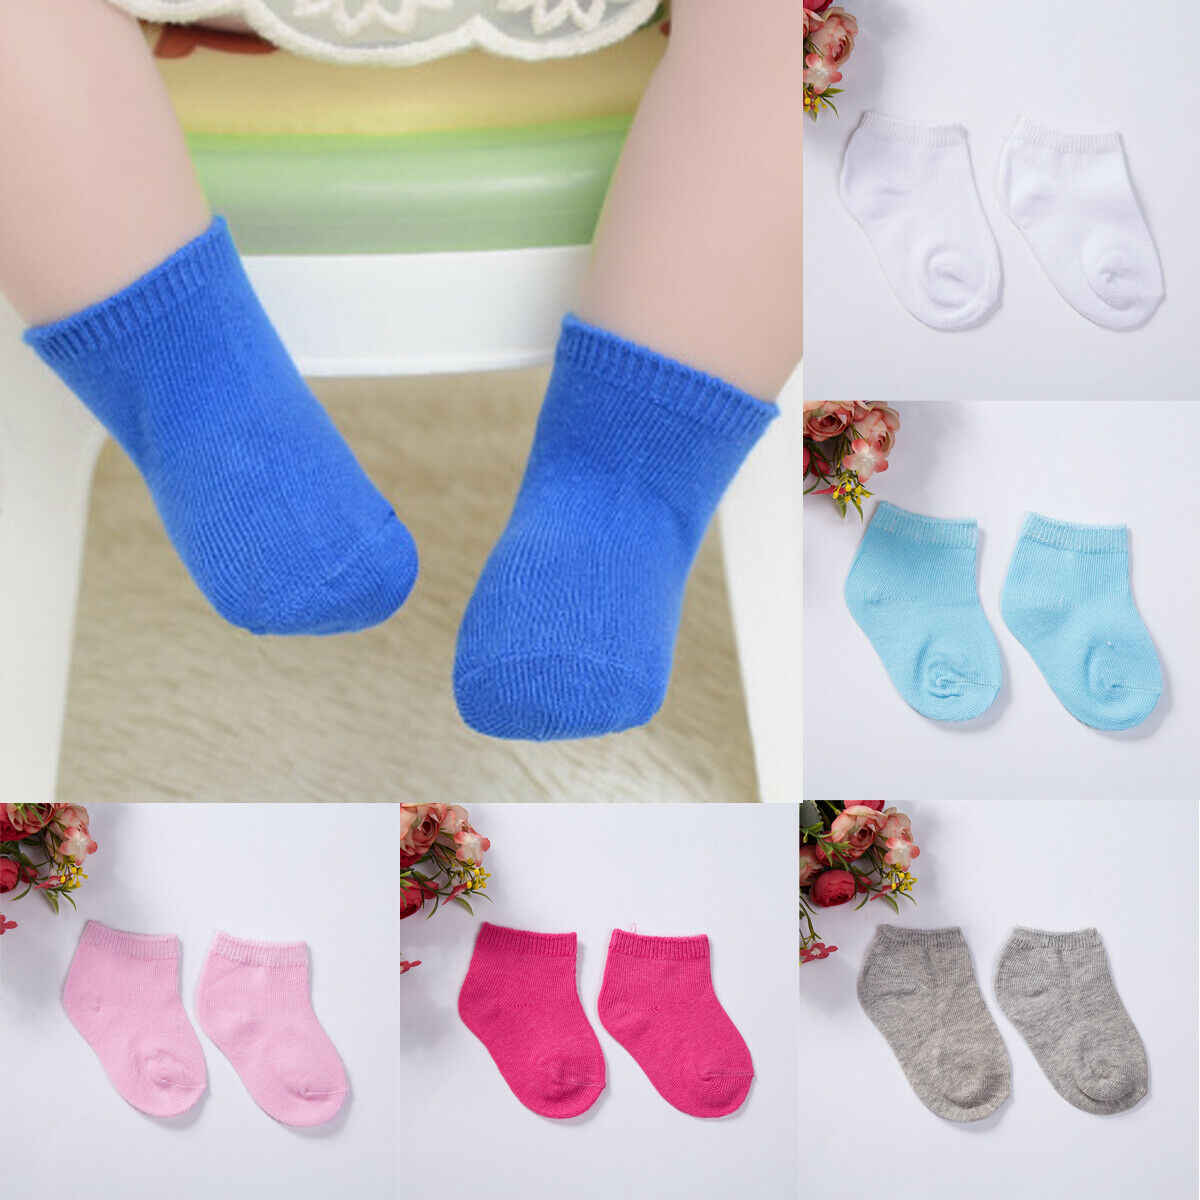 04364da27e1da Soft Spring/Summer Baby Socks Solid Toddler Socks Baby Boy/ Girl ...